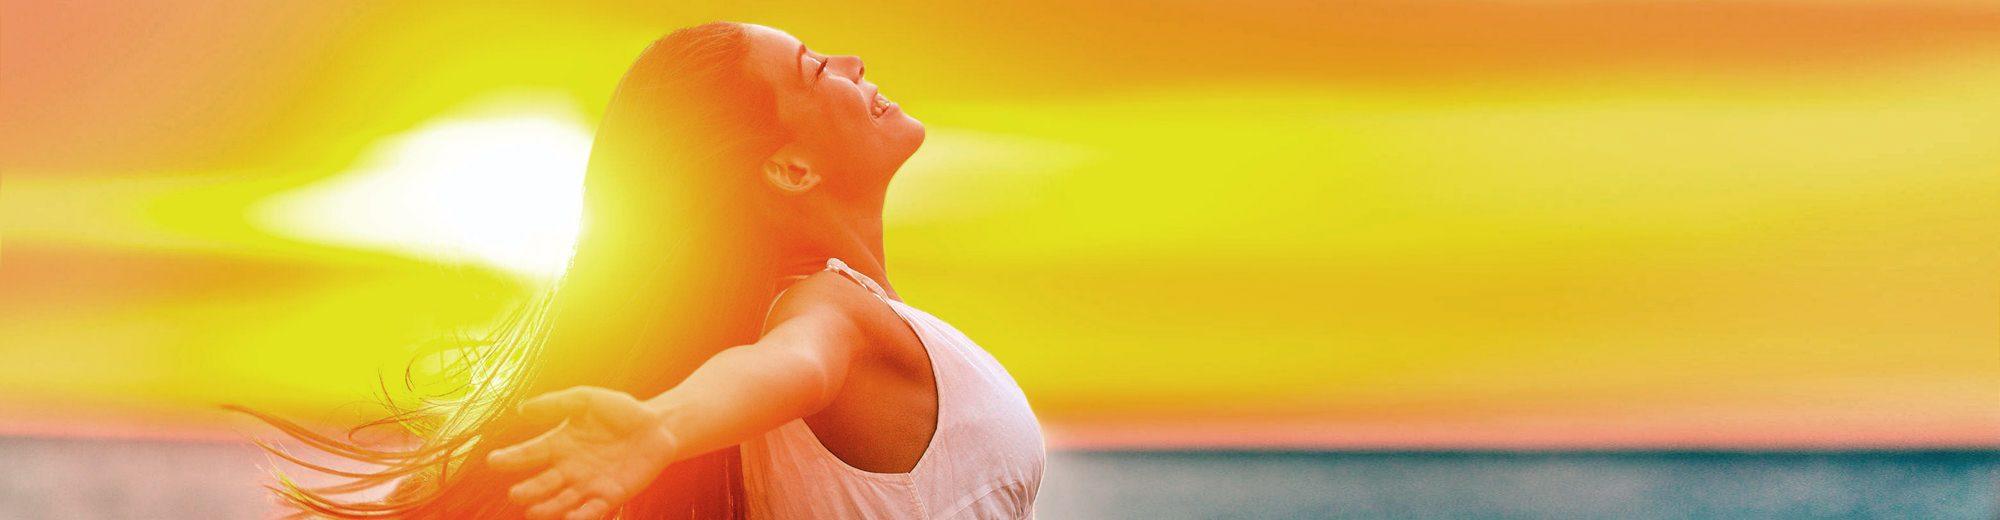 Lebensfreude - Dein Leben verändern